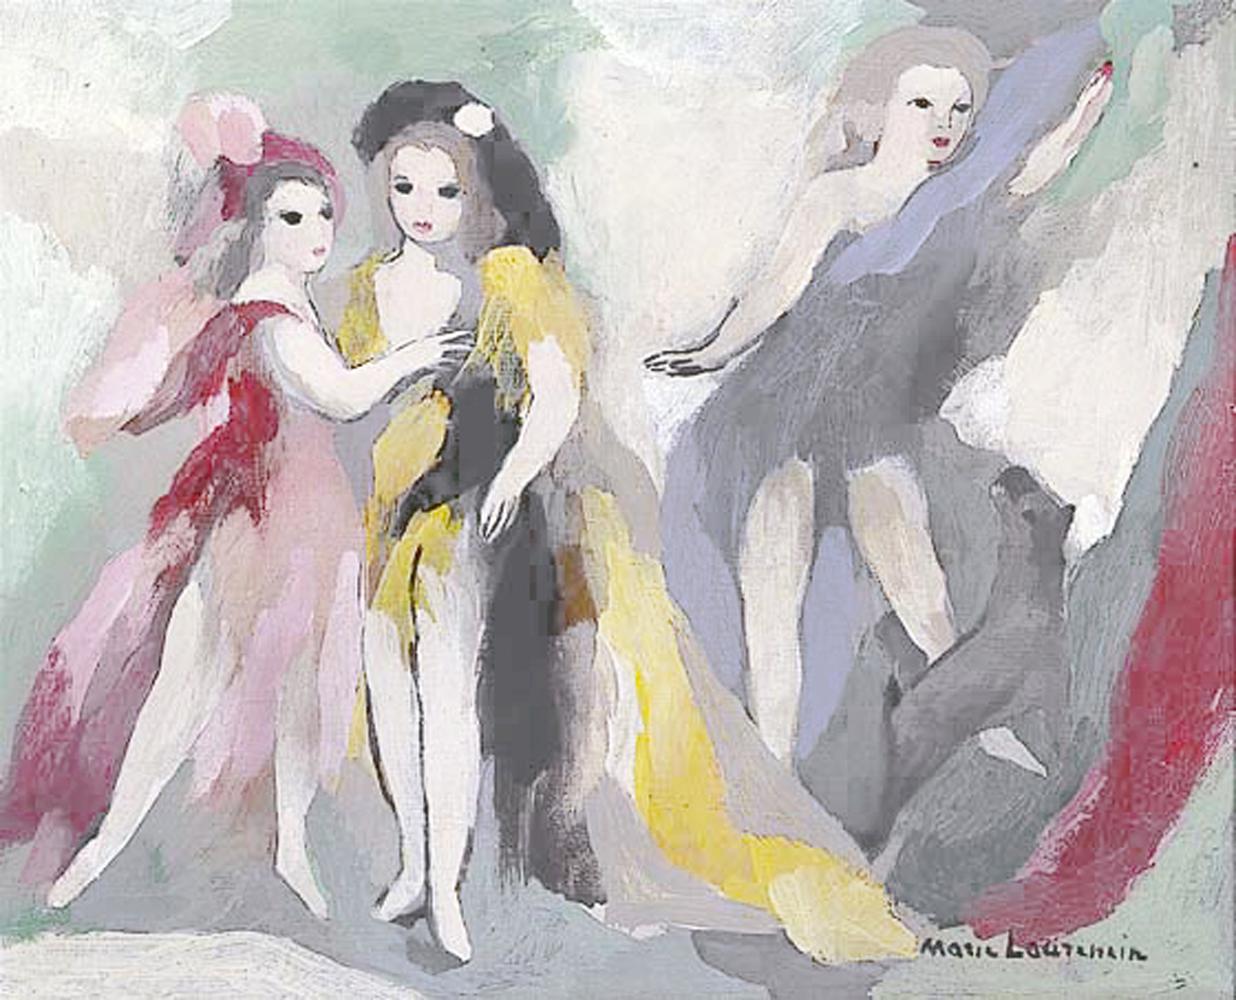 Bien connu MARIE LAURENCIN MUSEE MARMOTTANT MONET PARIS 16 FF42